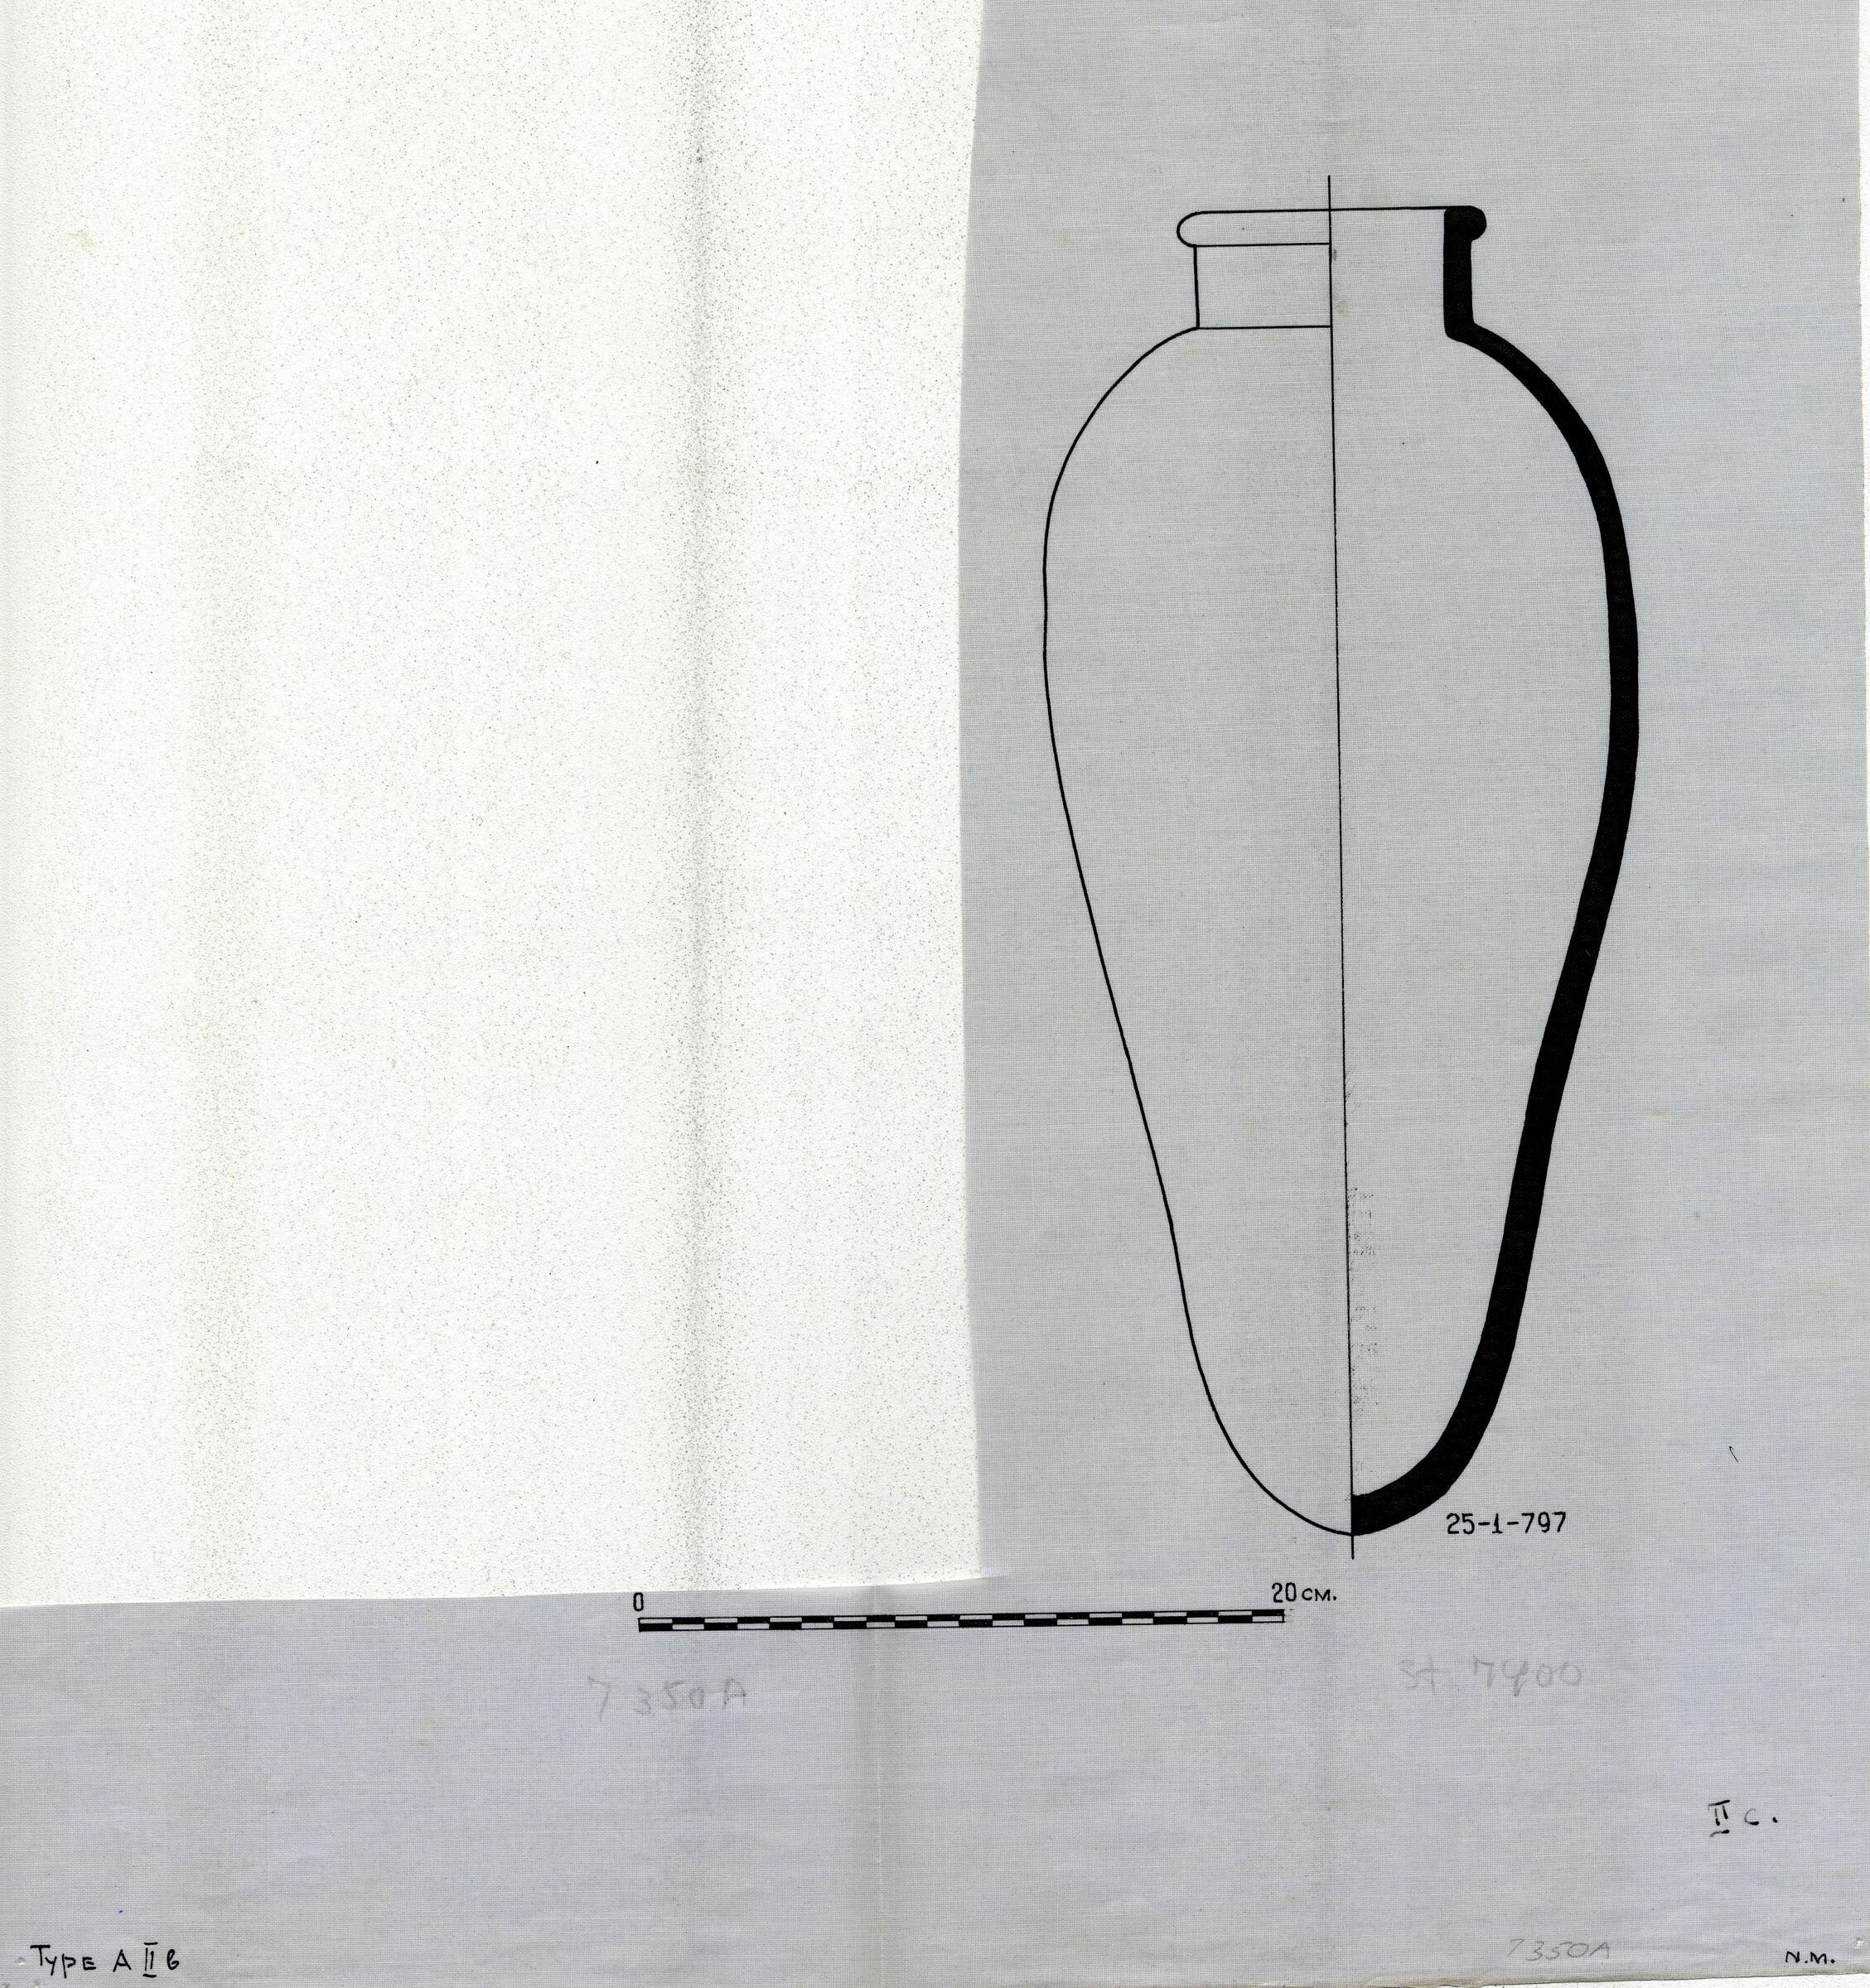 Drawings: Street G 7400, S of G 7420: pottery, jar